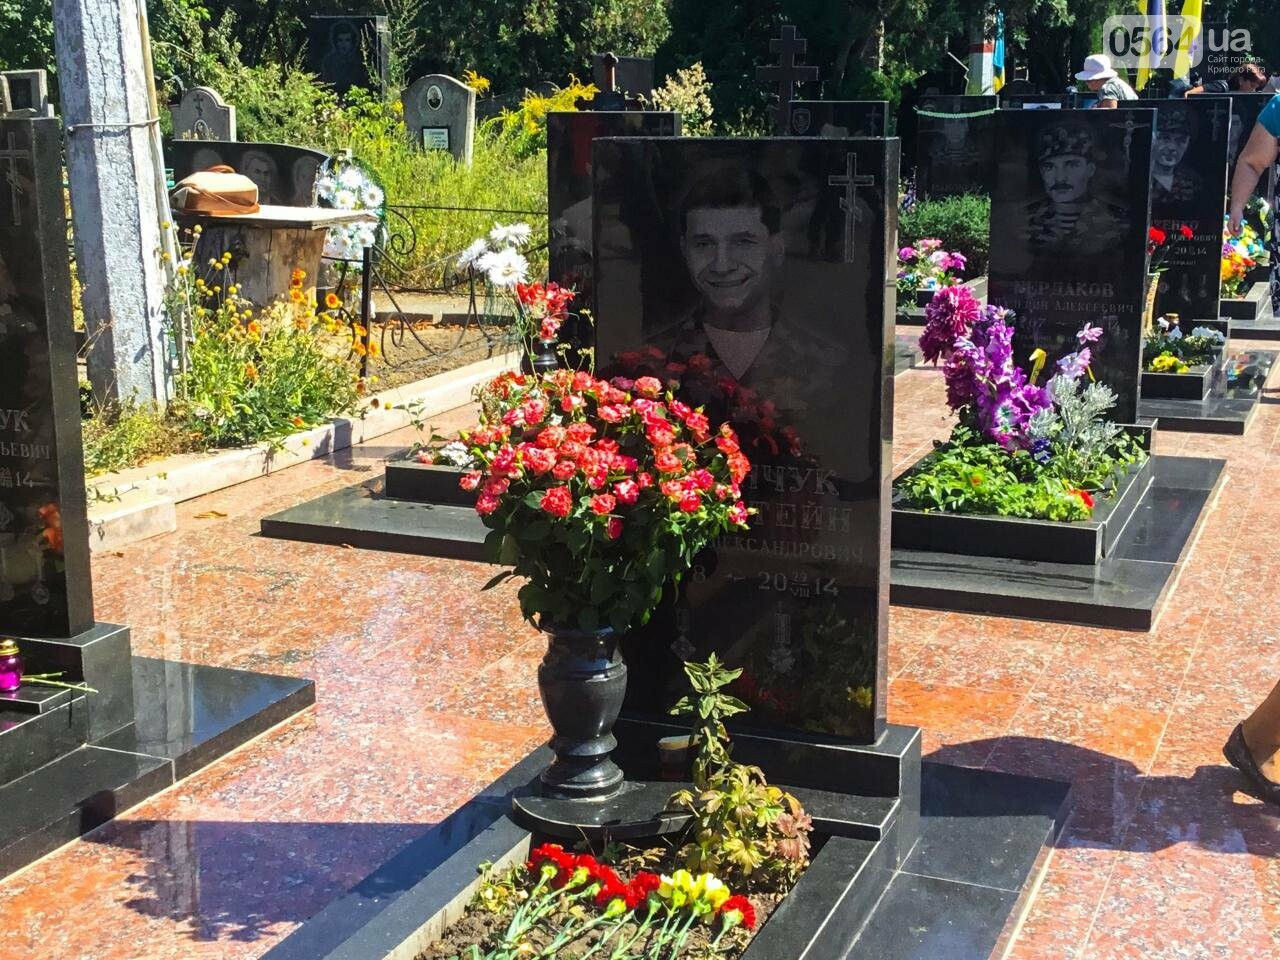 На Аллее Героев провели панихиду по погибшим в зоне АТО криворожанам, - ФОТО , фото-20